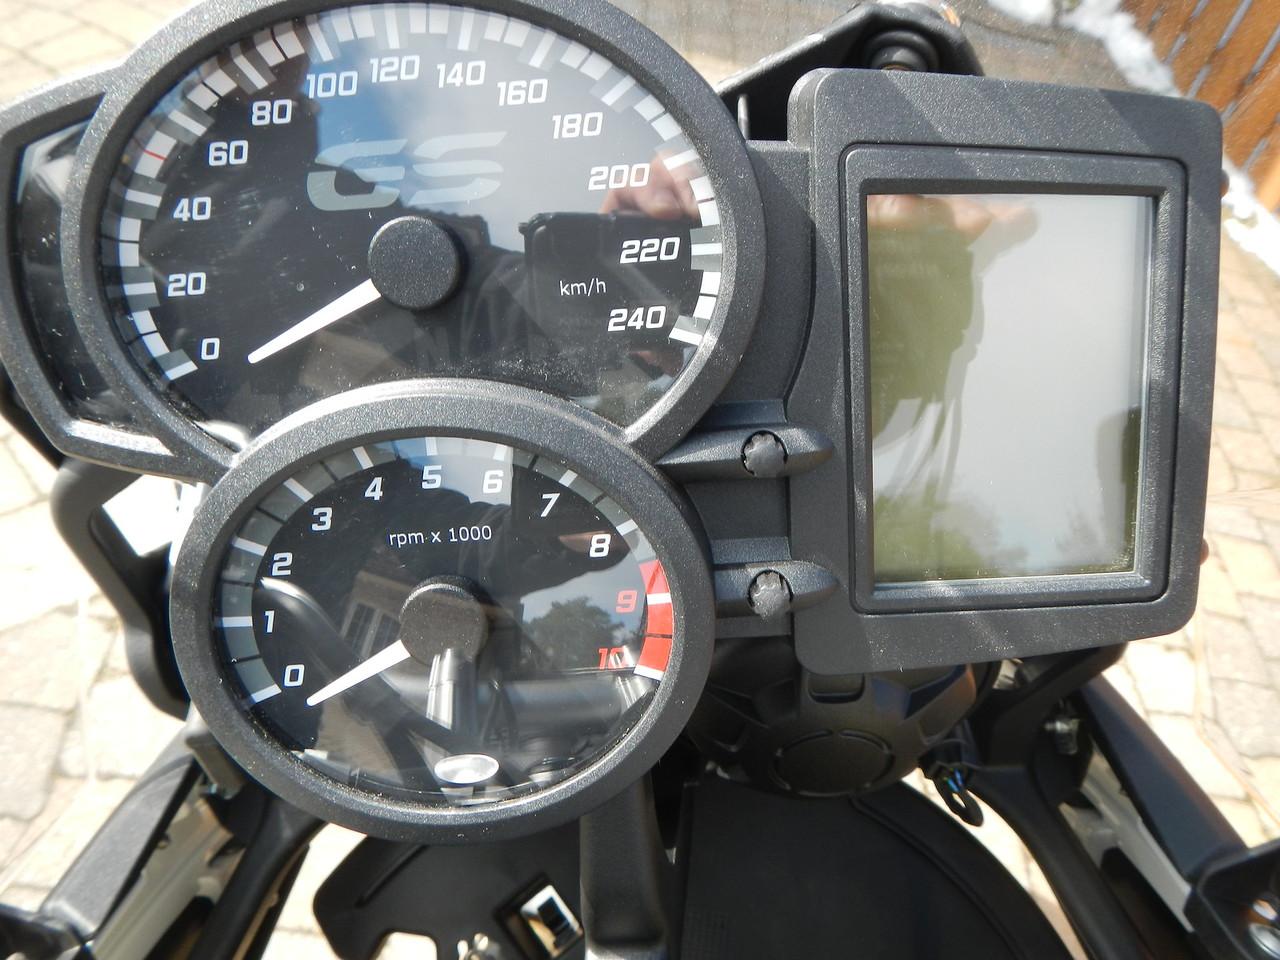 BMW F800GS model 2013. Instrumentenbord.